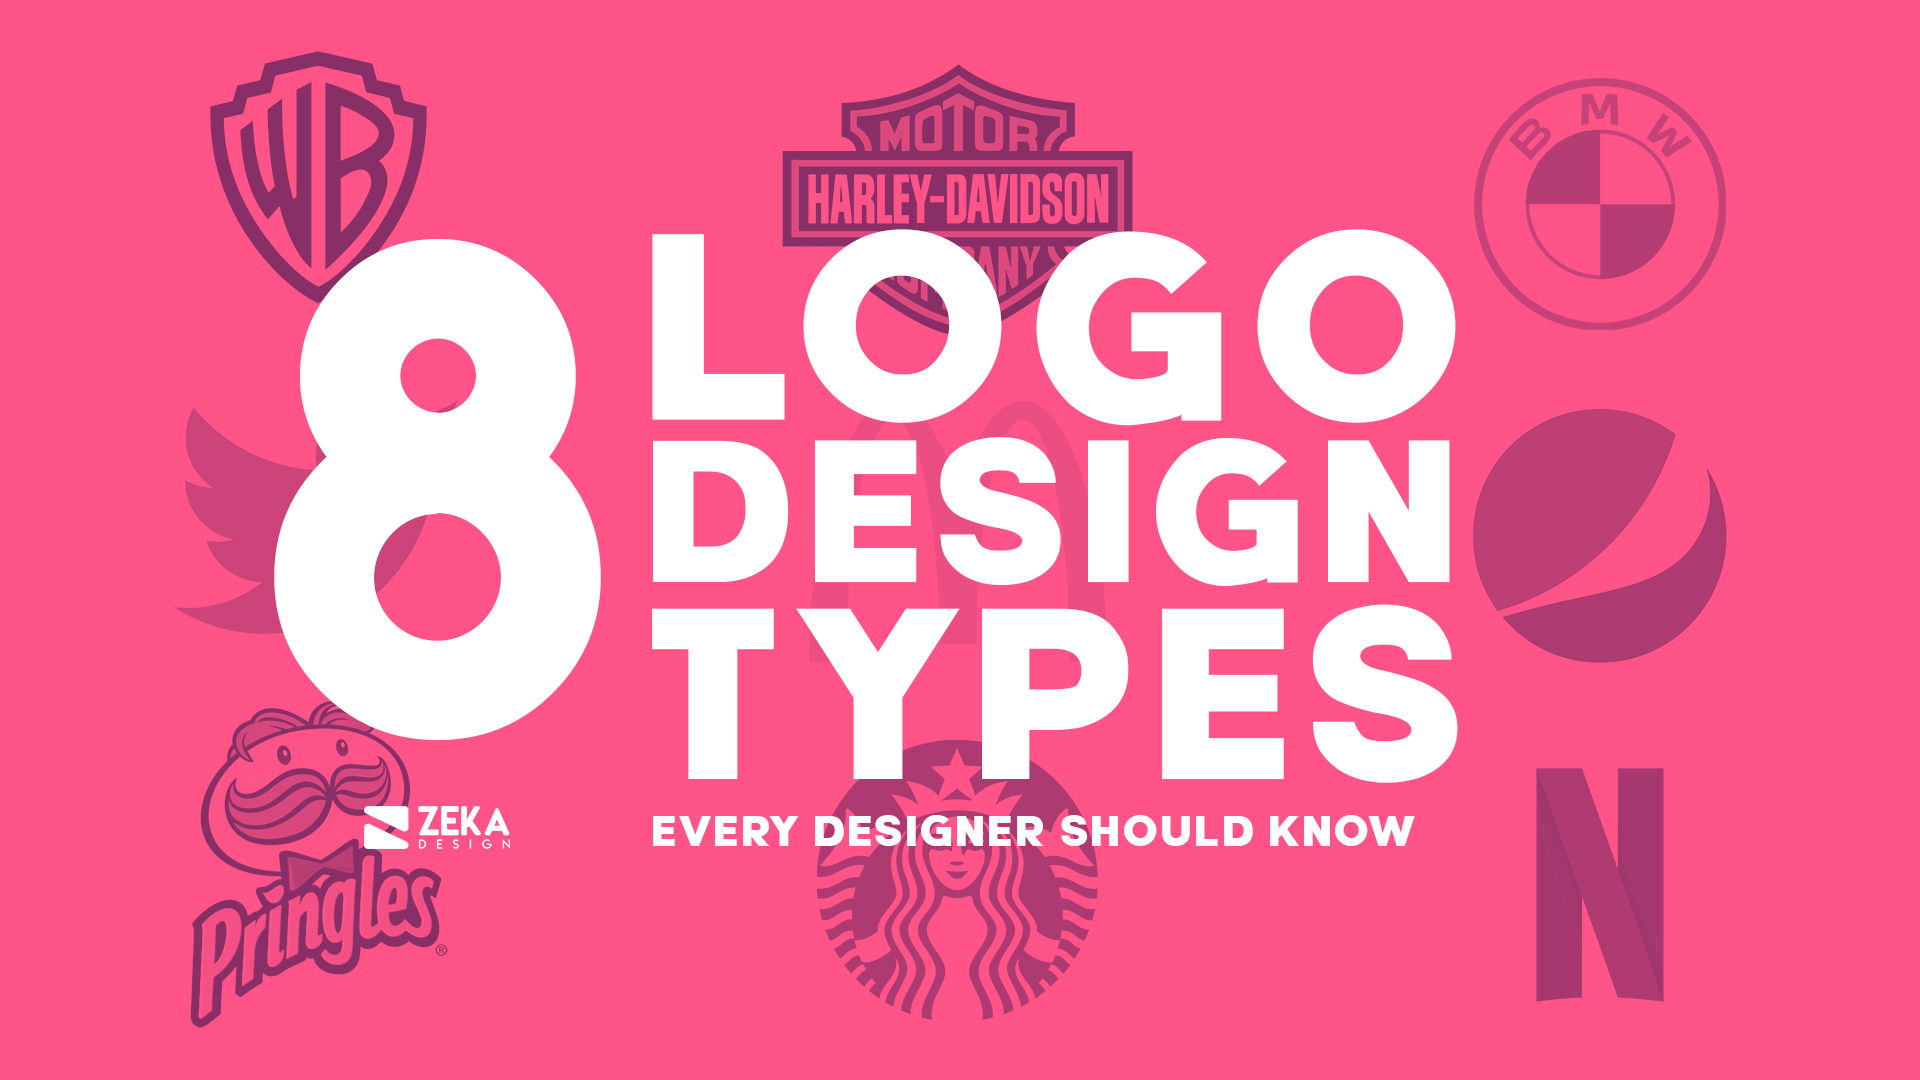 8 Logo Design Types Graphic Design Blog Ideas